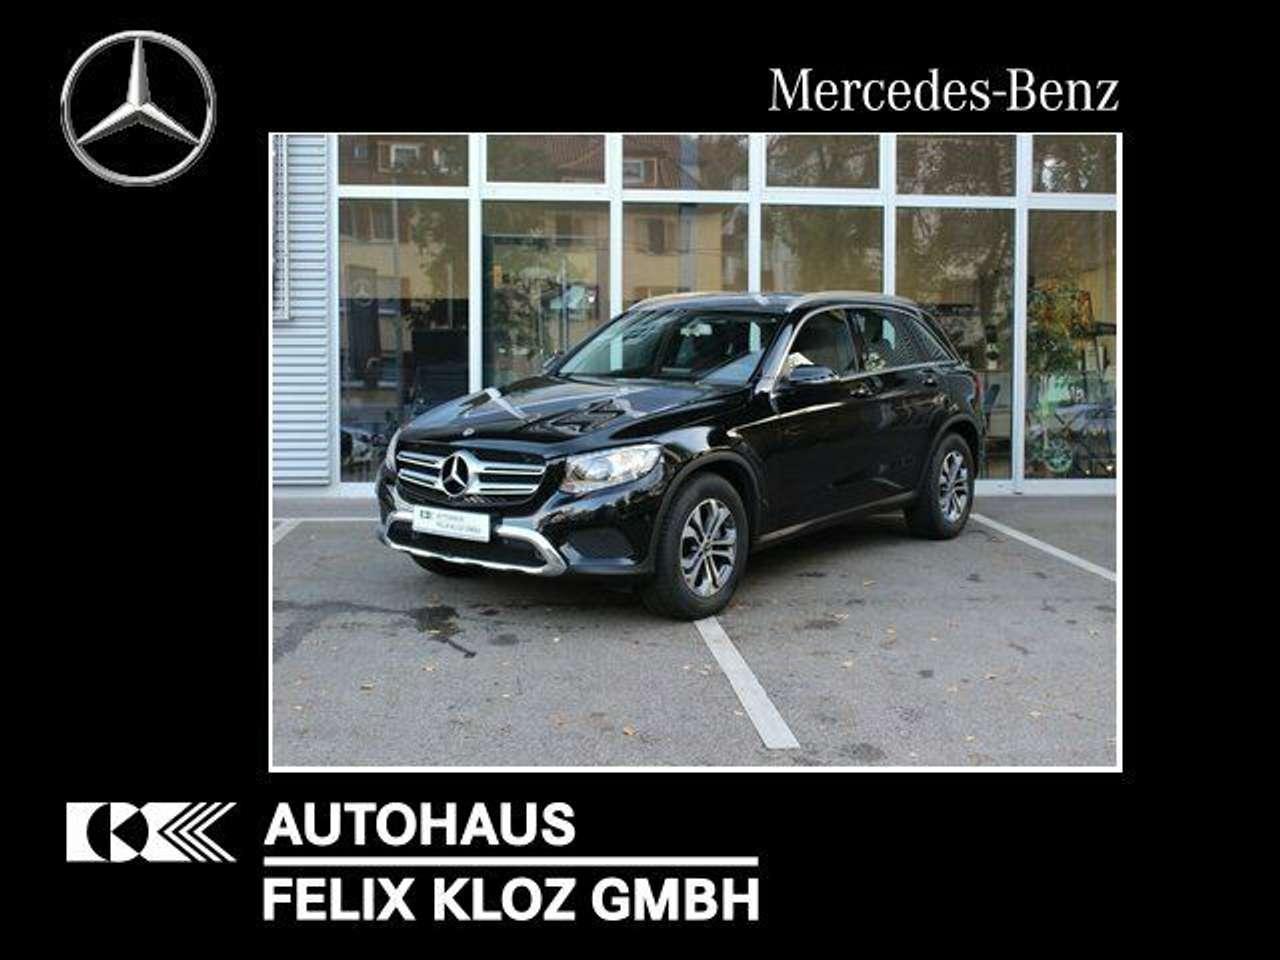 Used Mercedes Benz Glc-Class